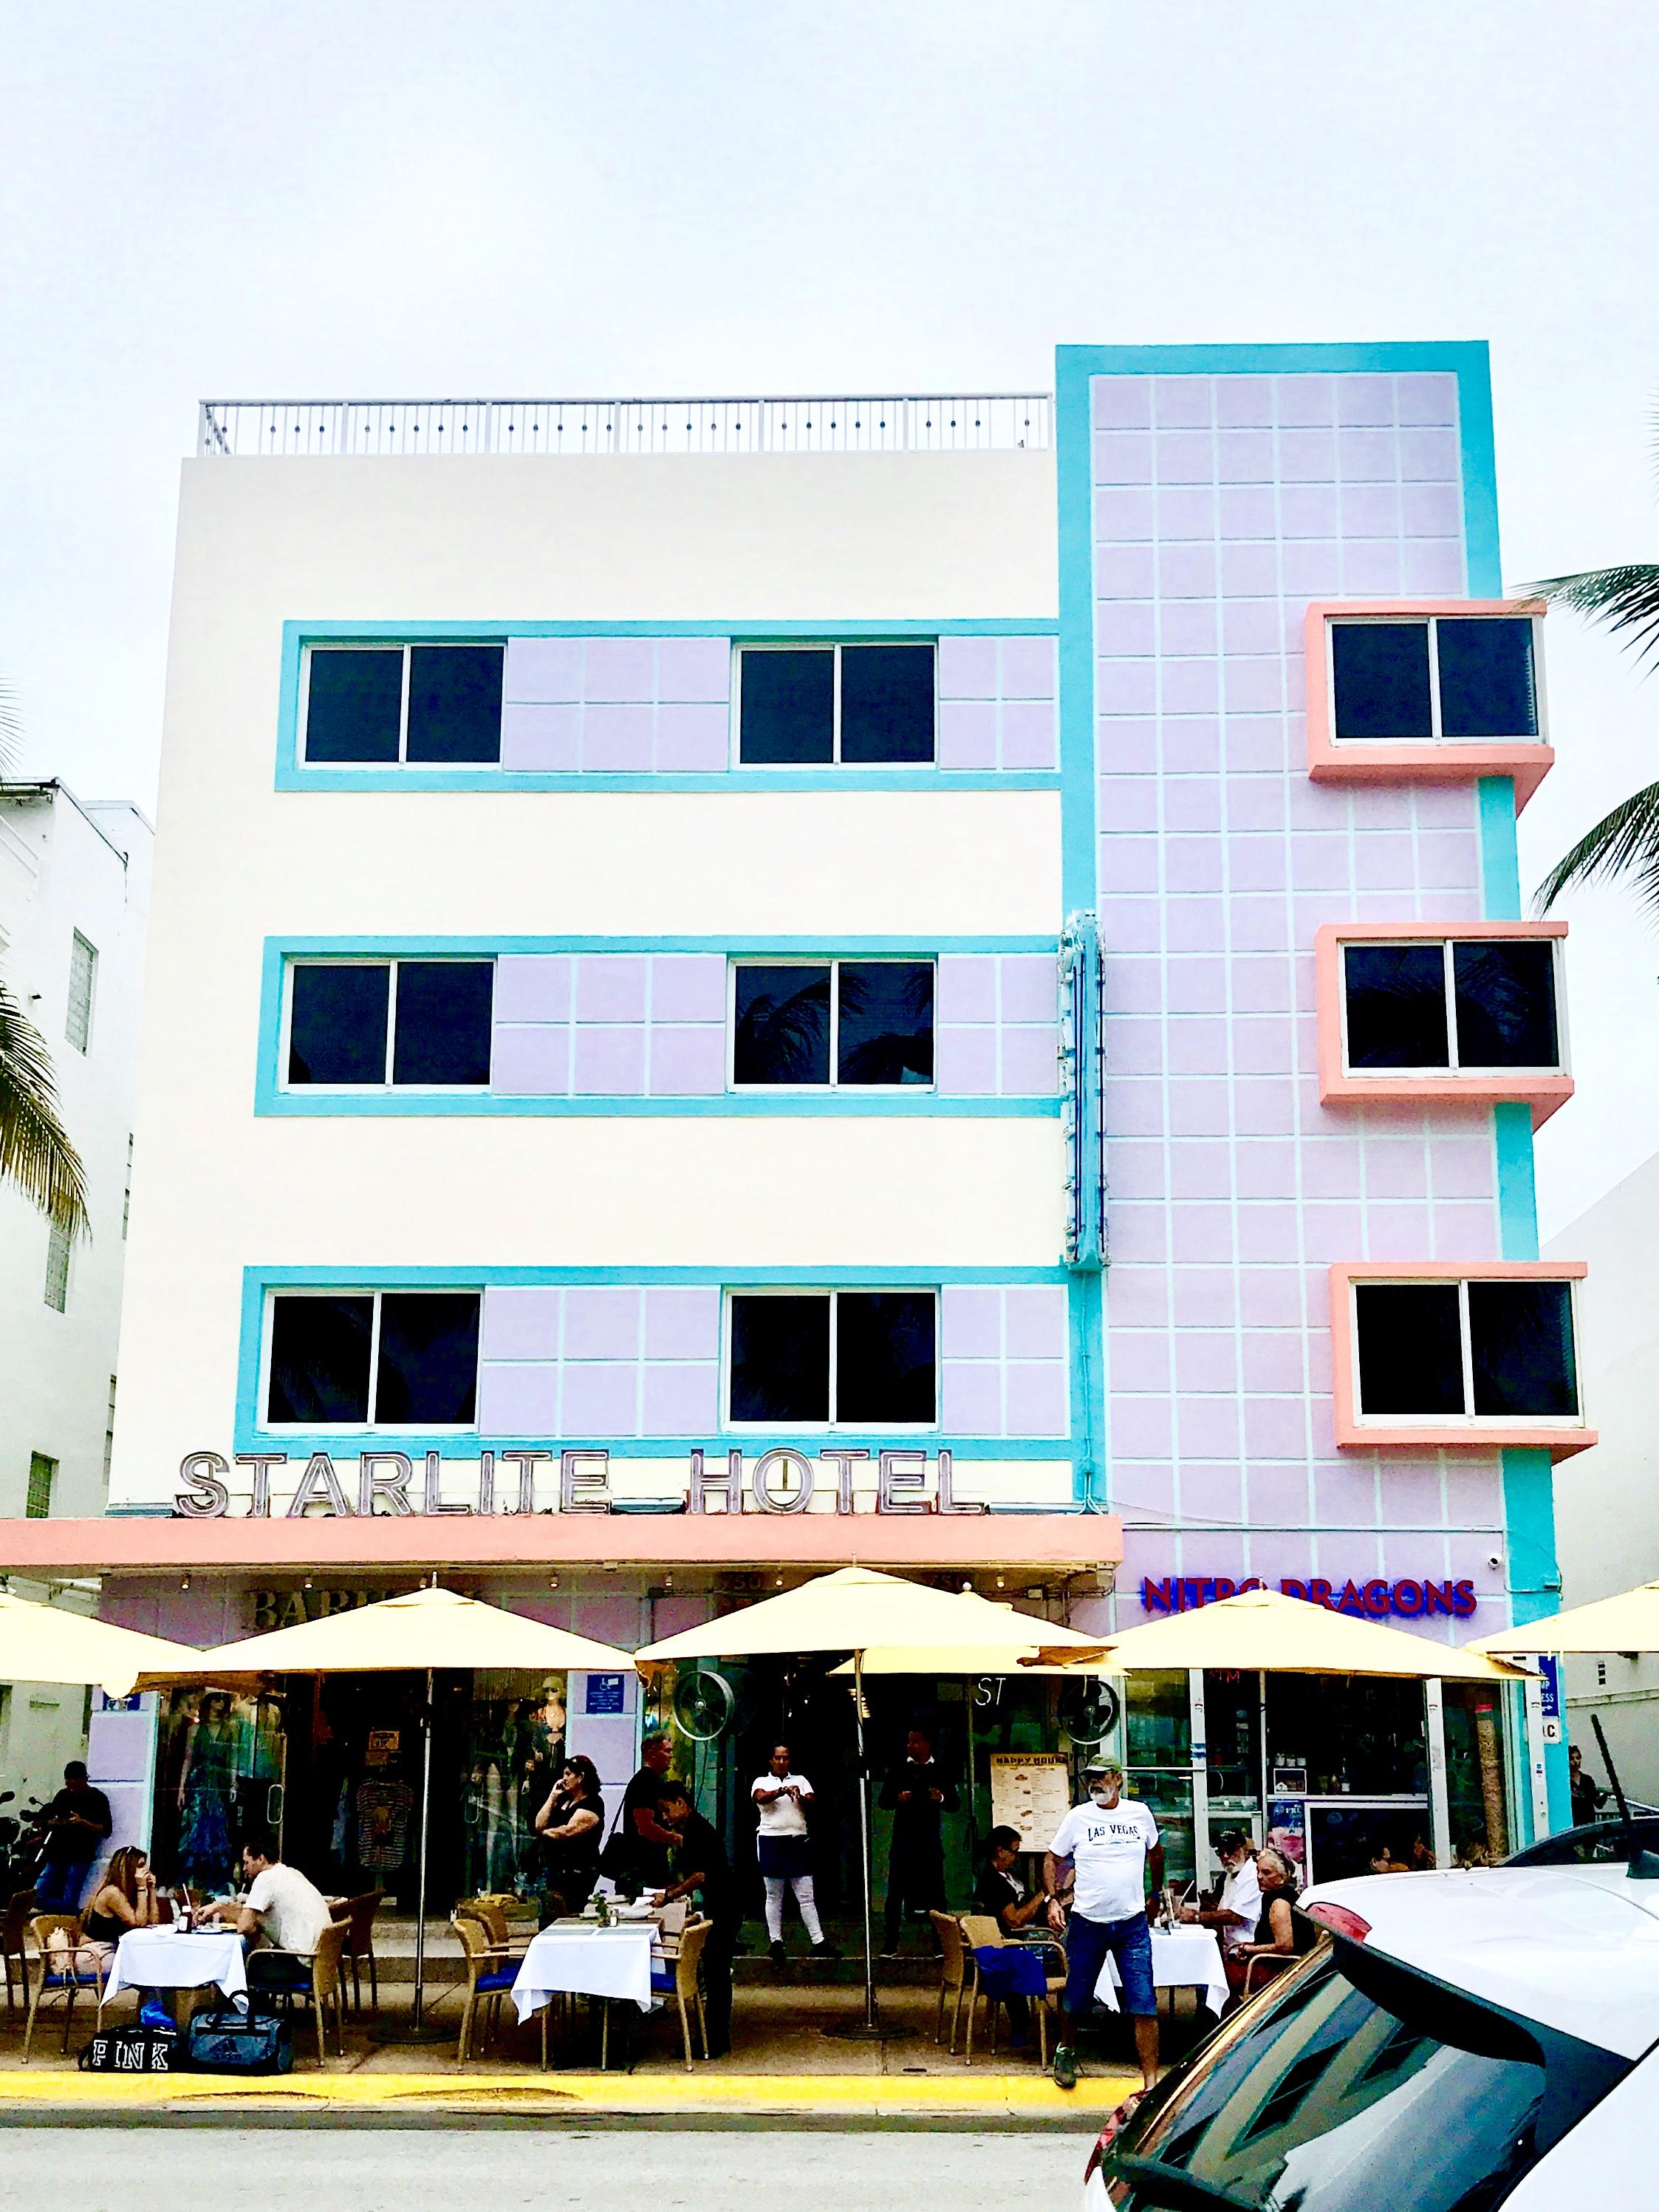 Starlite Hotel, Miami, Florida - Miami's Art Deco Architecture Walking Tour